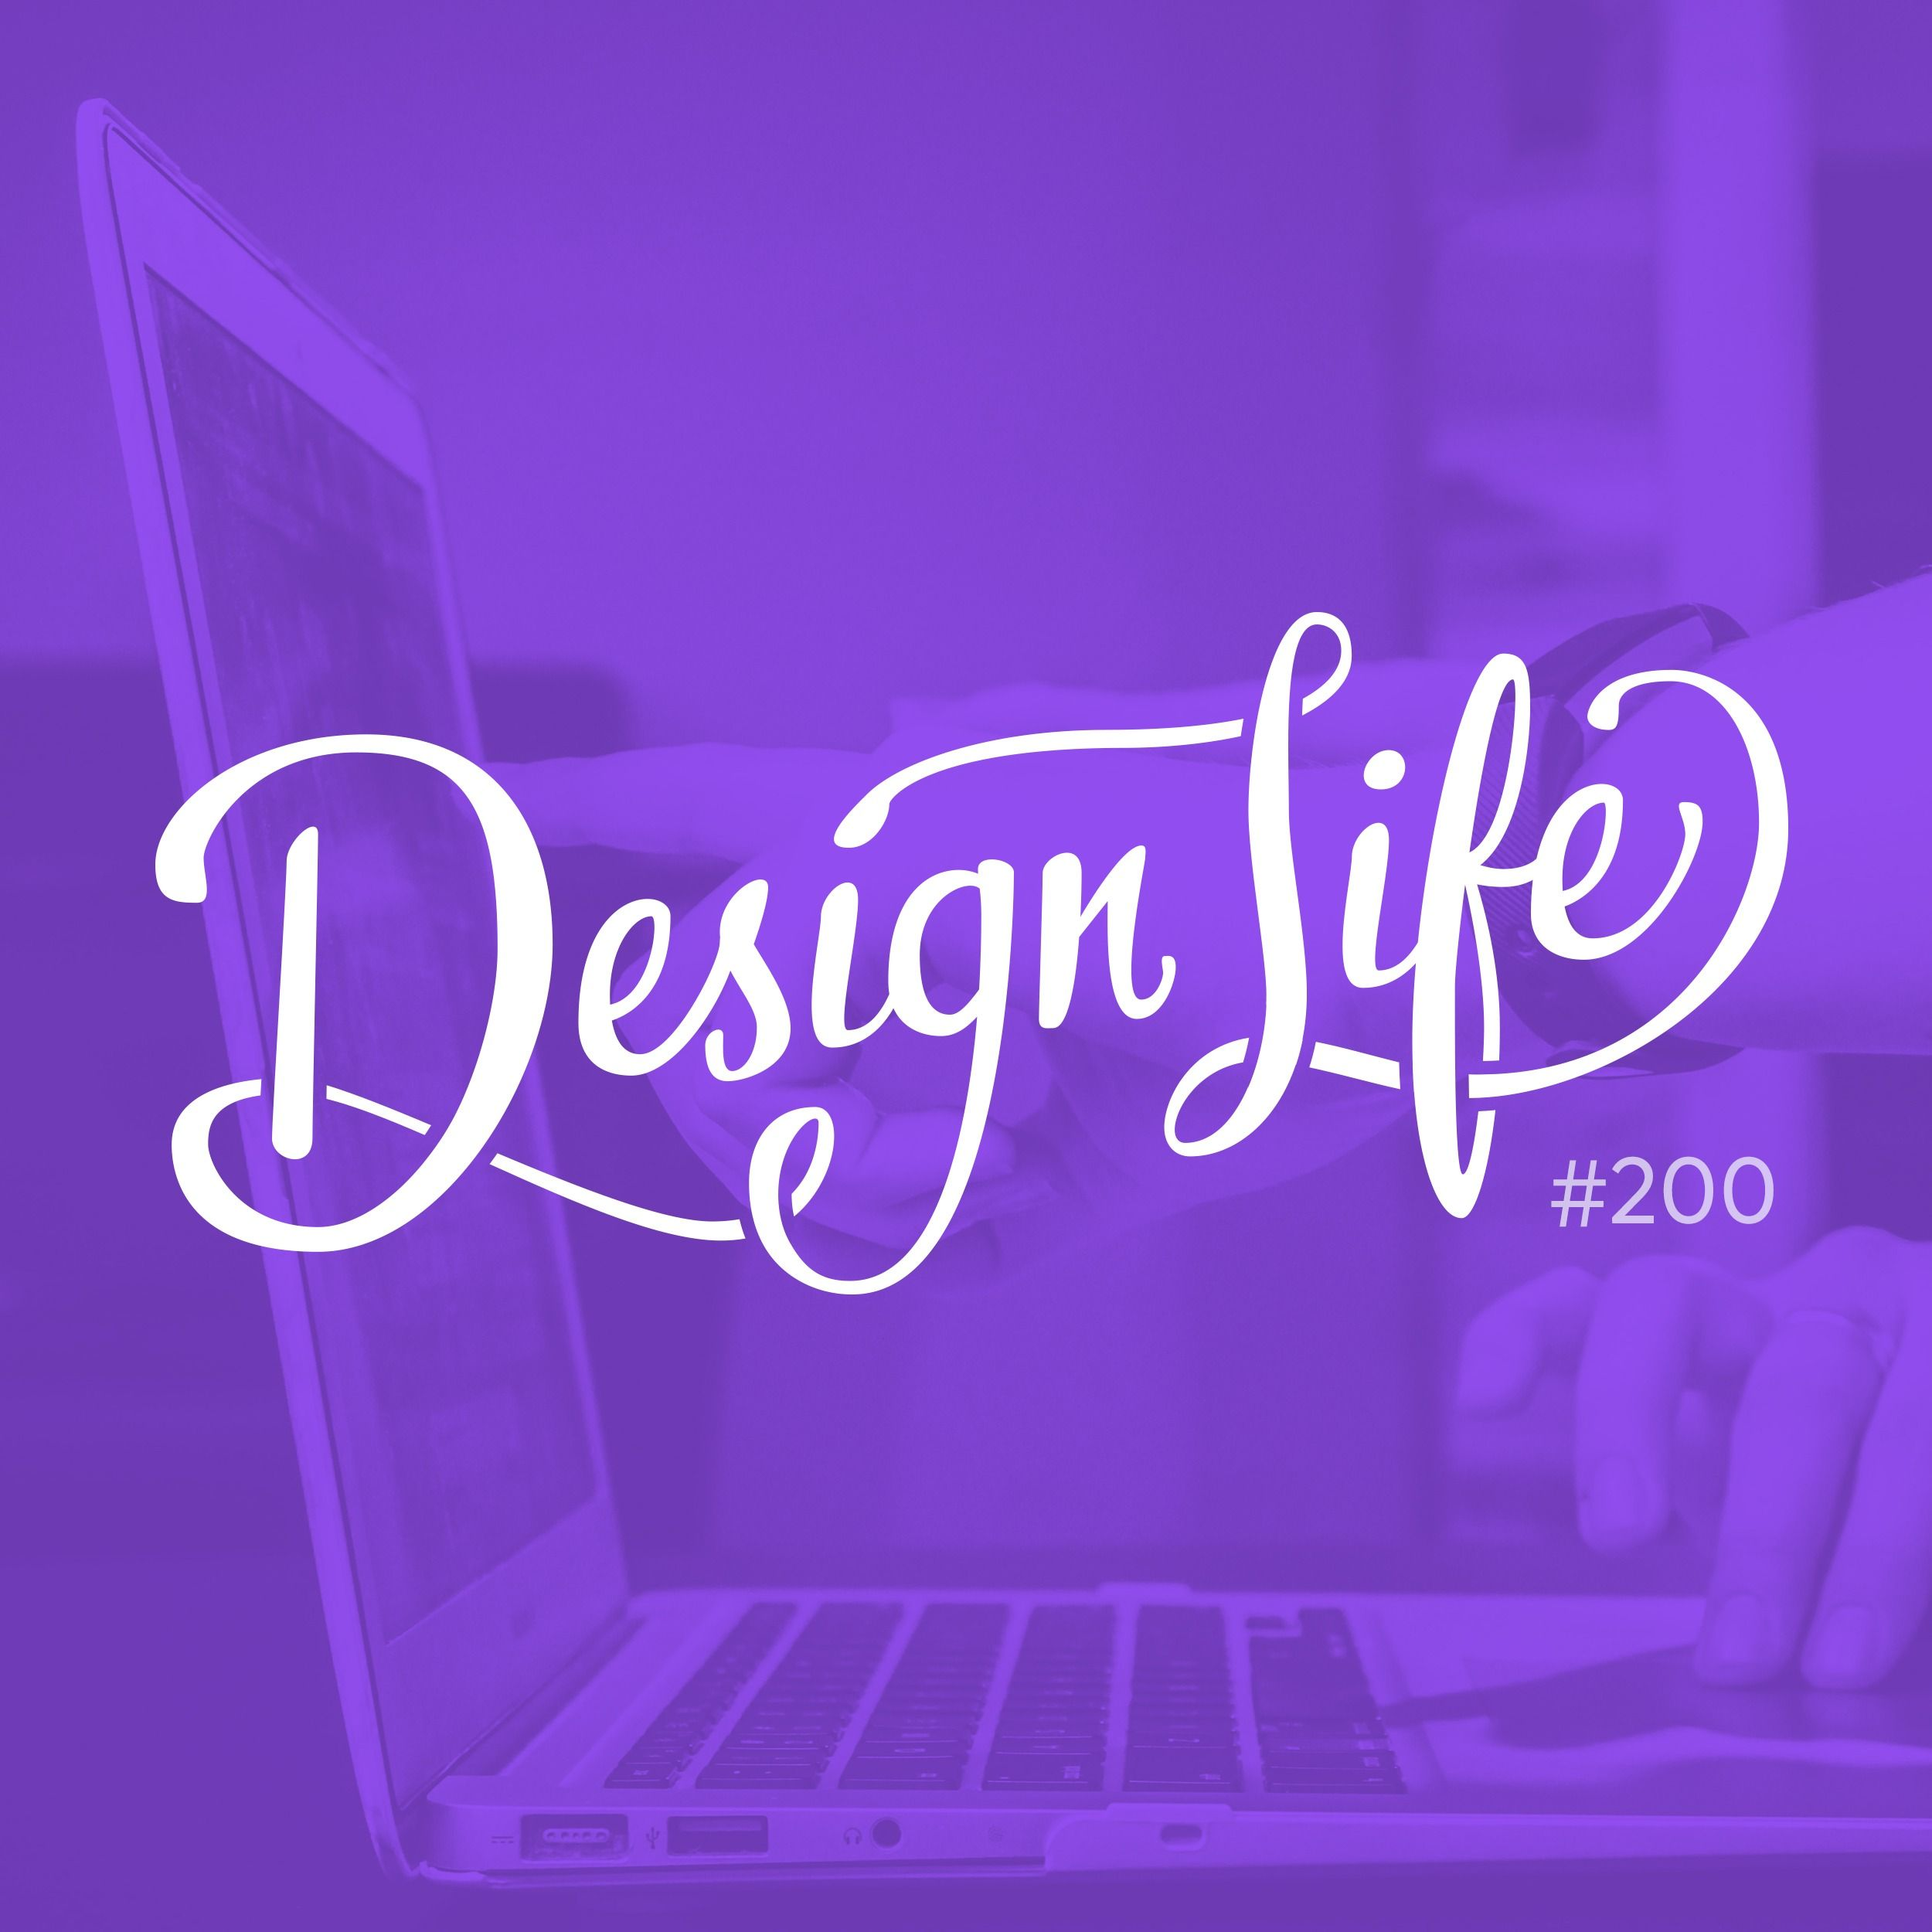 200: Does using design freebies make you less of a designer?